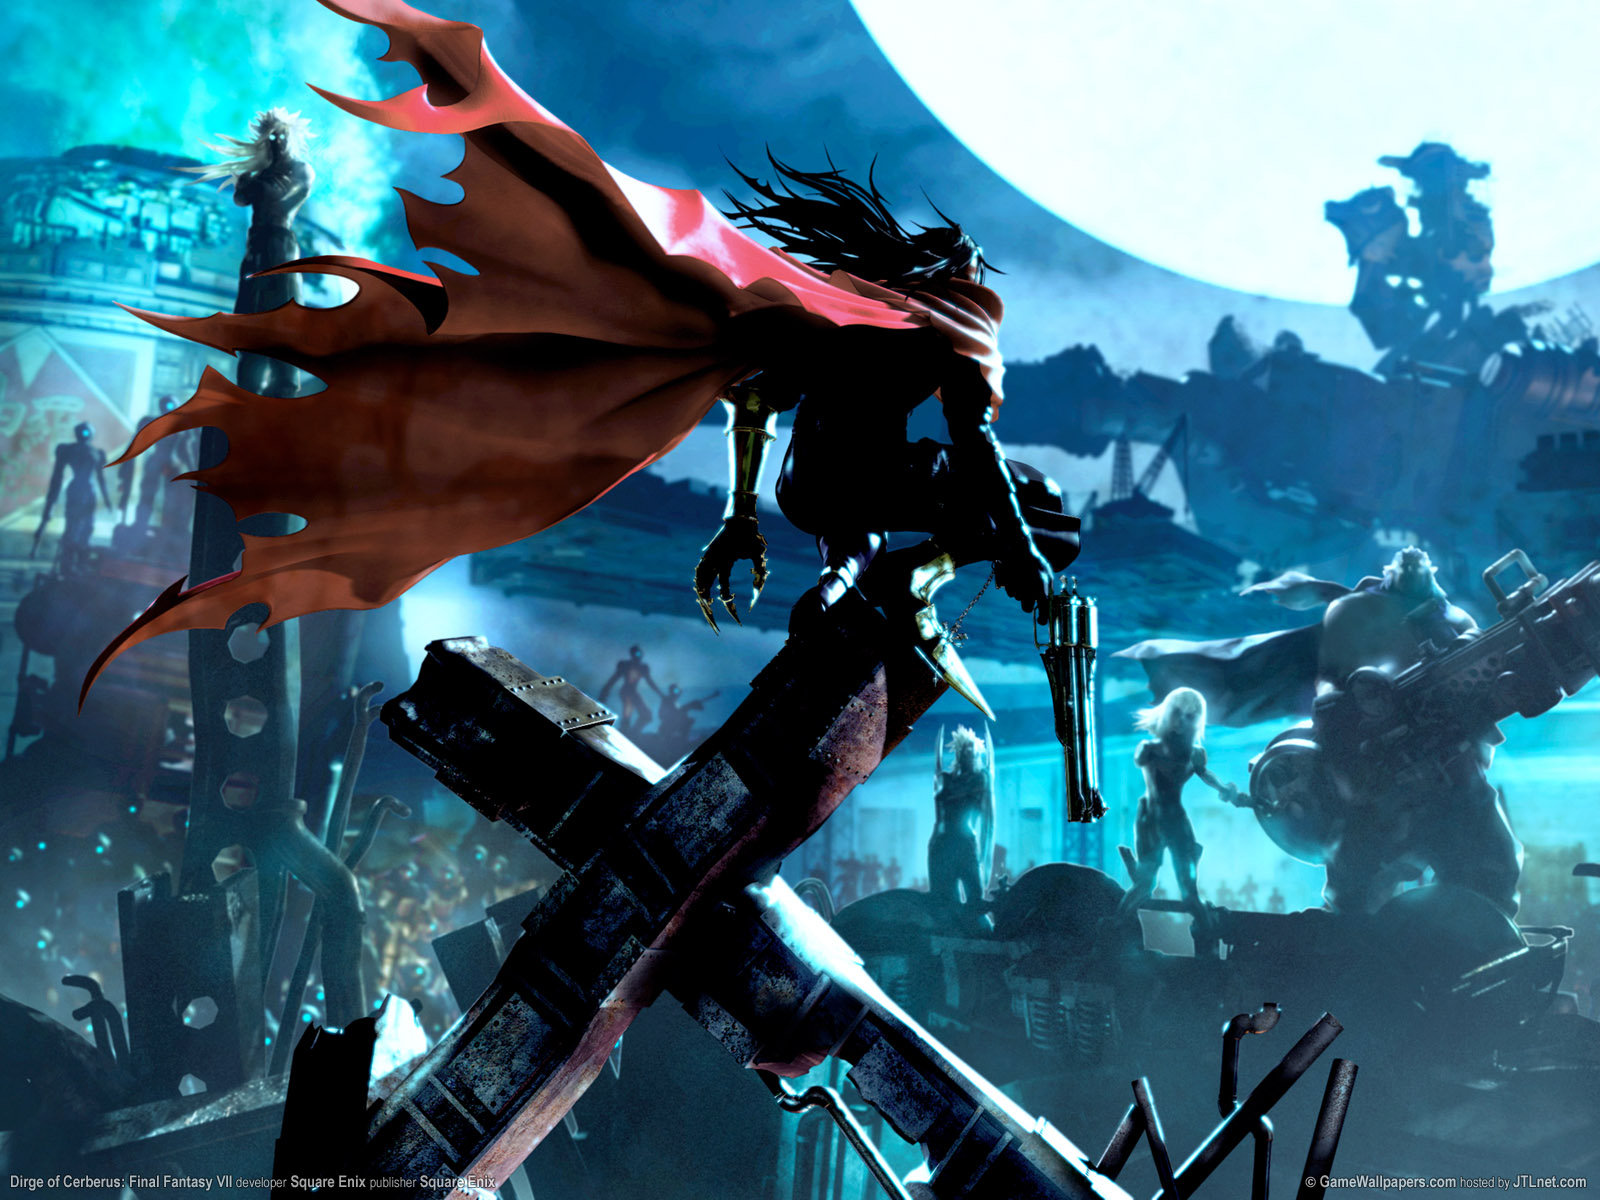 dirge_of_cerberus_final_fantasy_vii_03_1600x1200.jpg